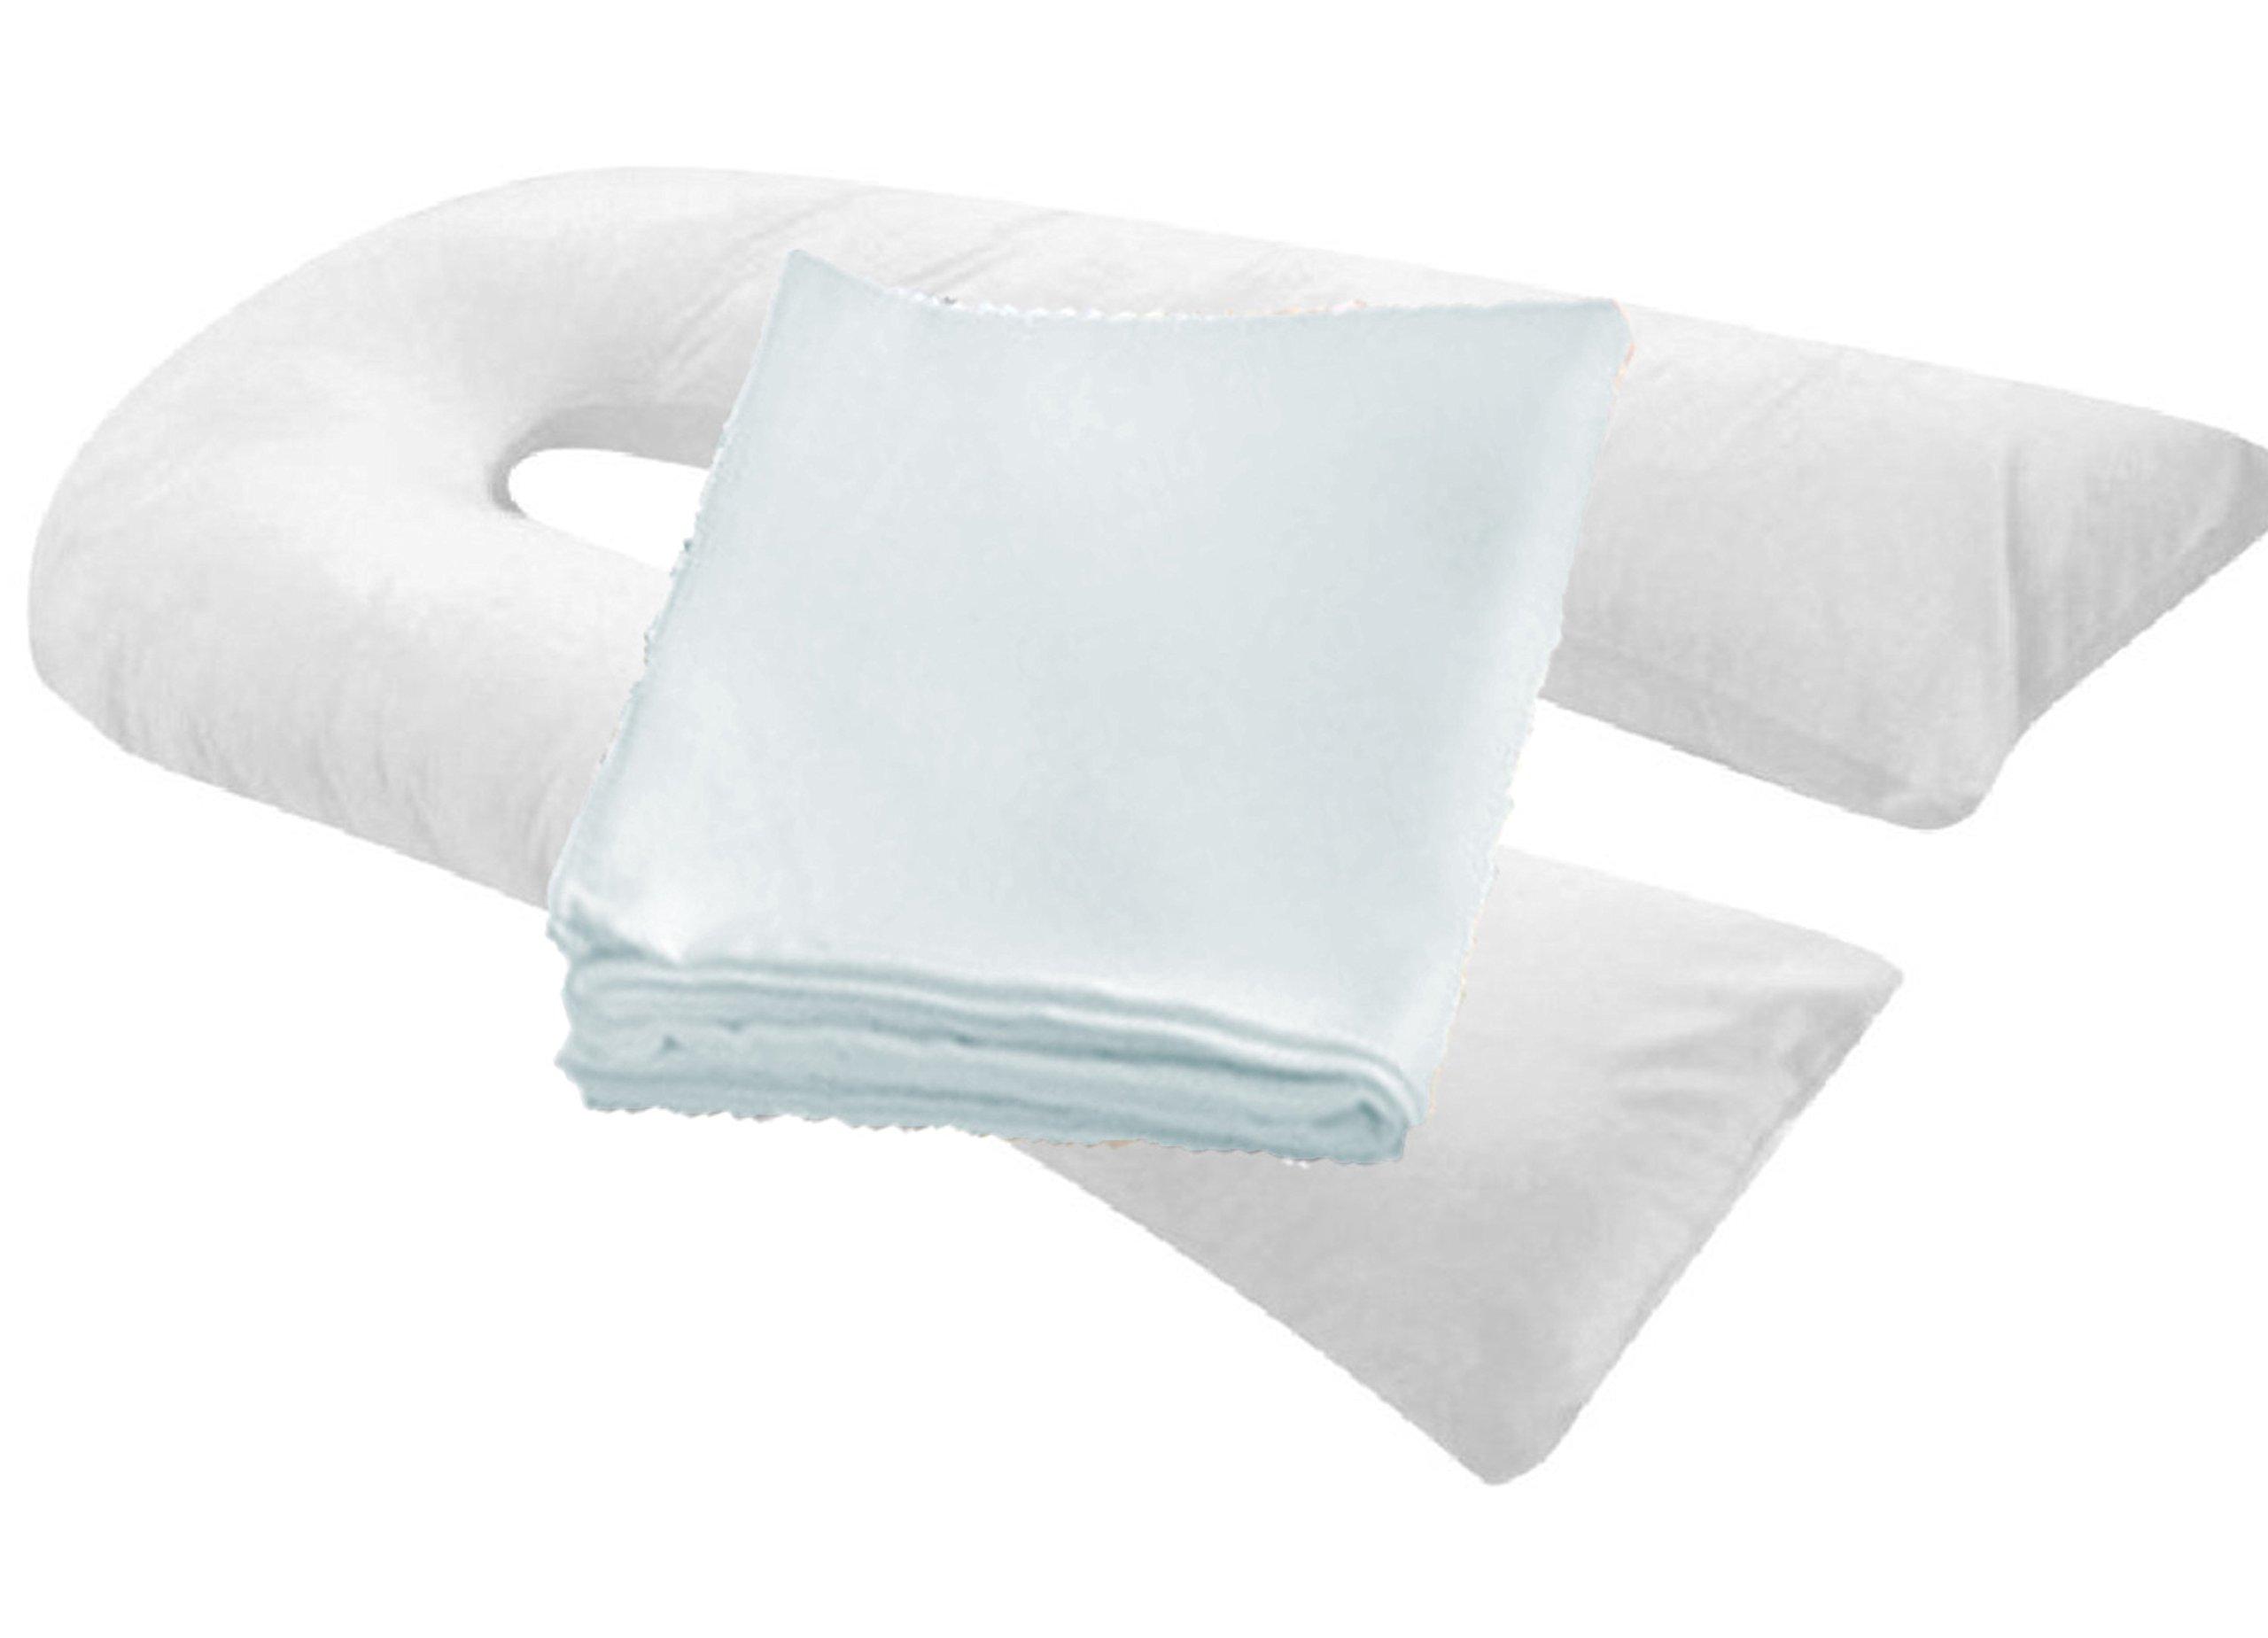 "20"" X 130"" Oversized Body Pillowcase/cover - Zipper End"